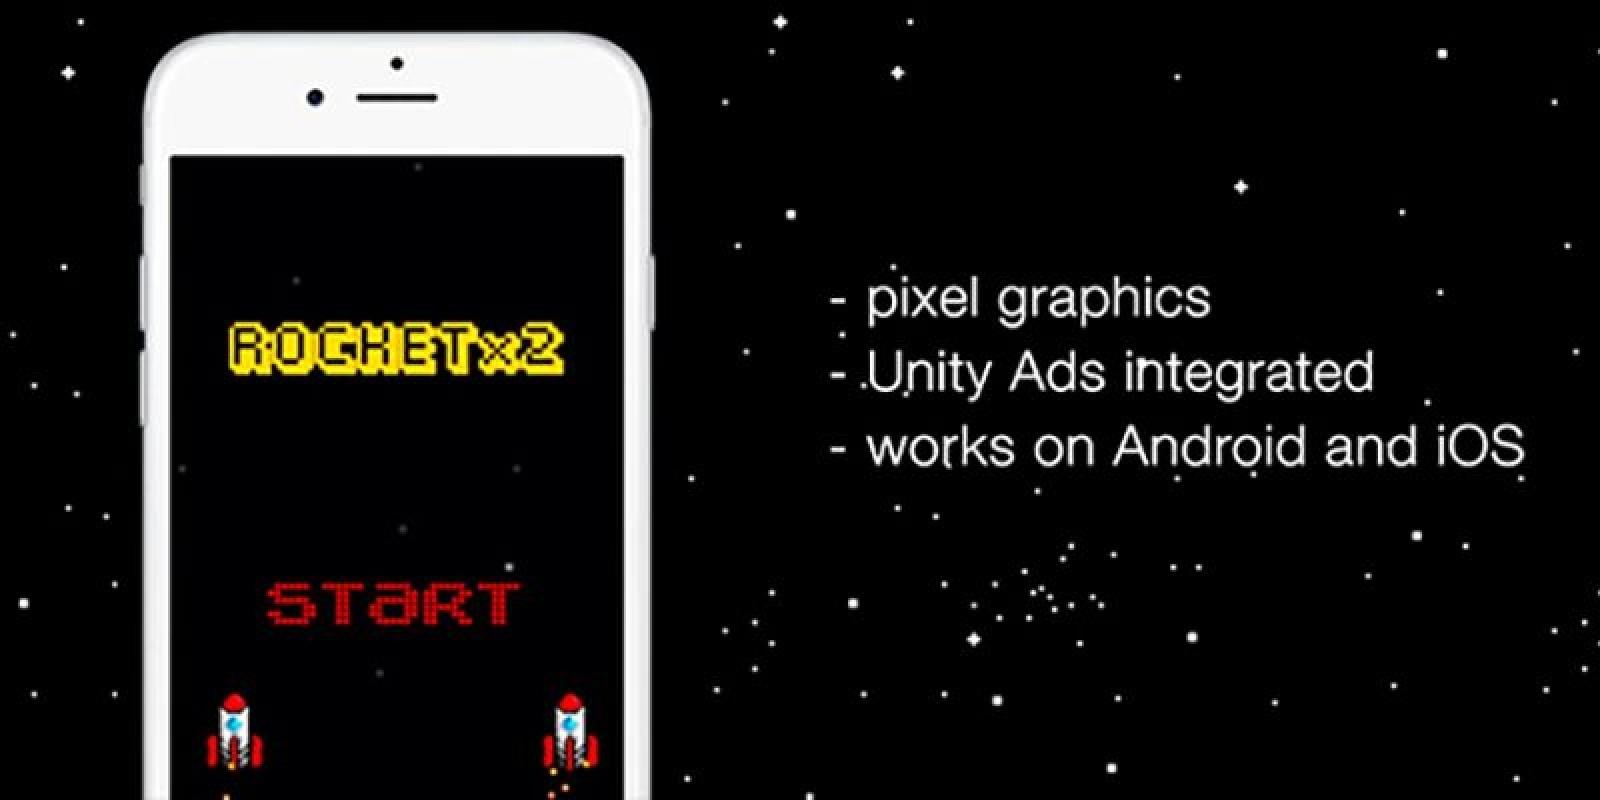 Rocket x 2 - Unity App Source Code